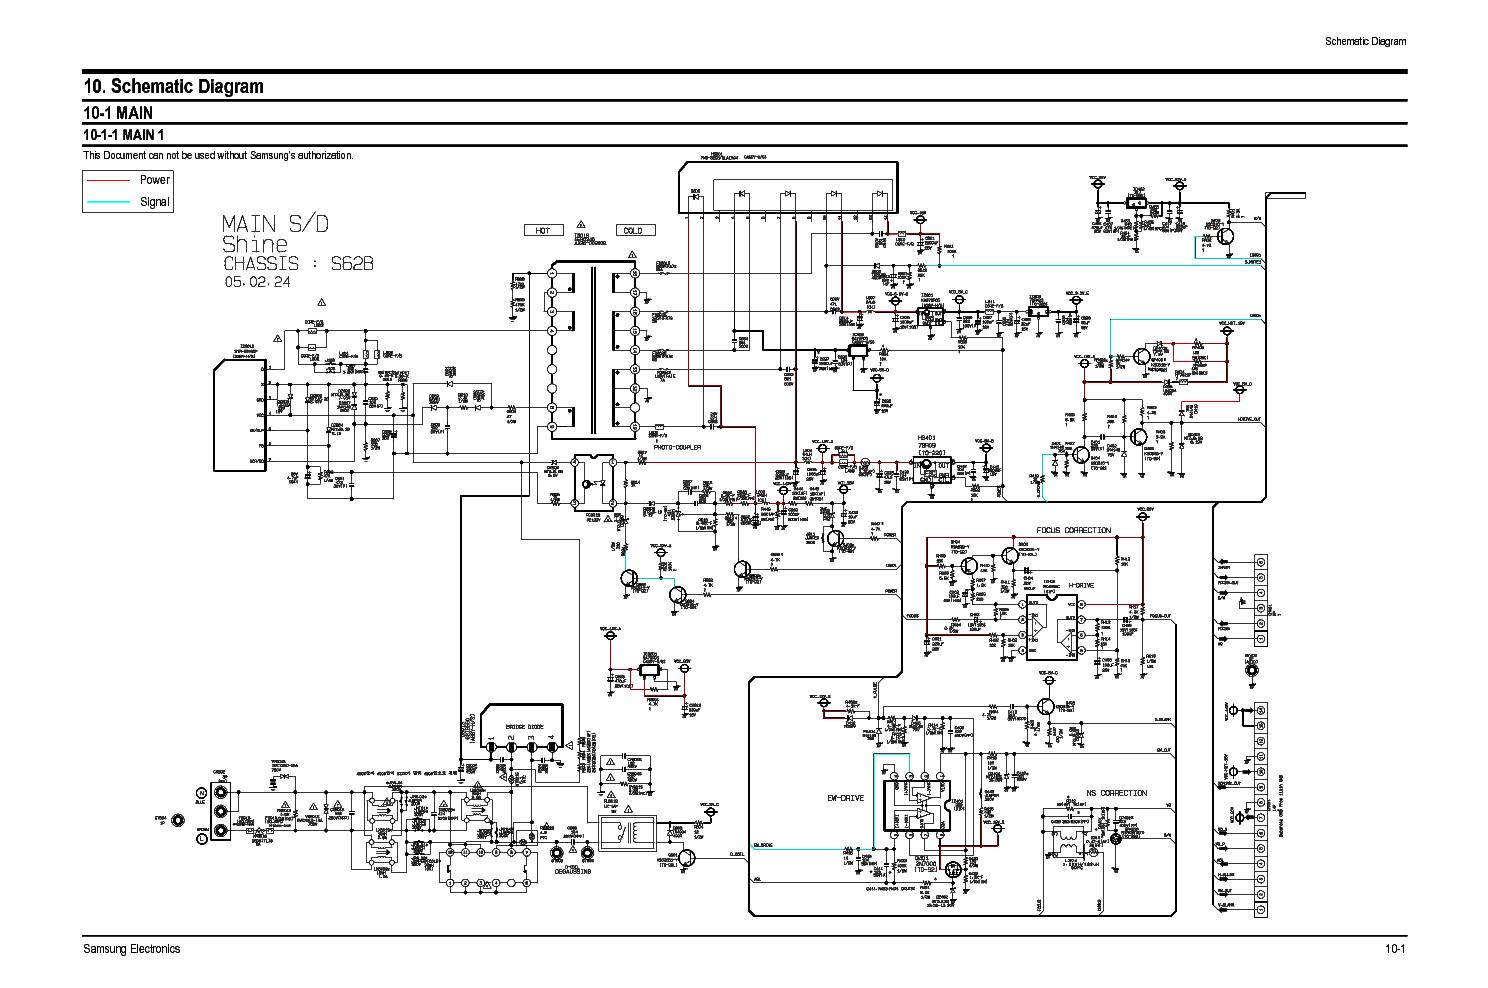 Схема производства работ на дороге